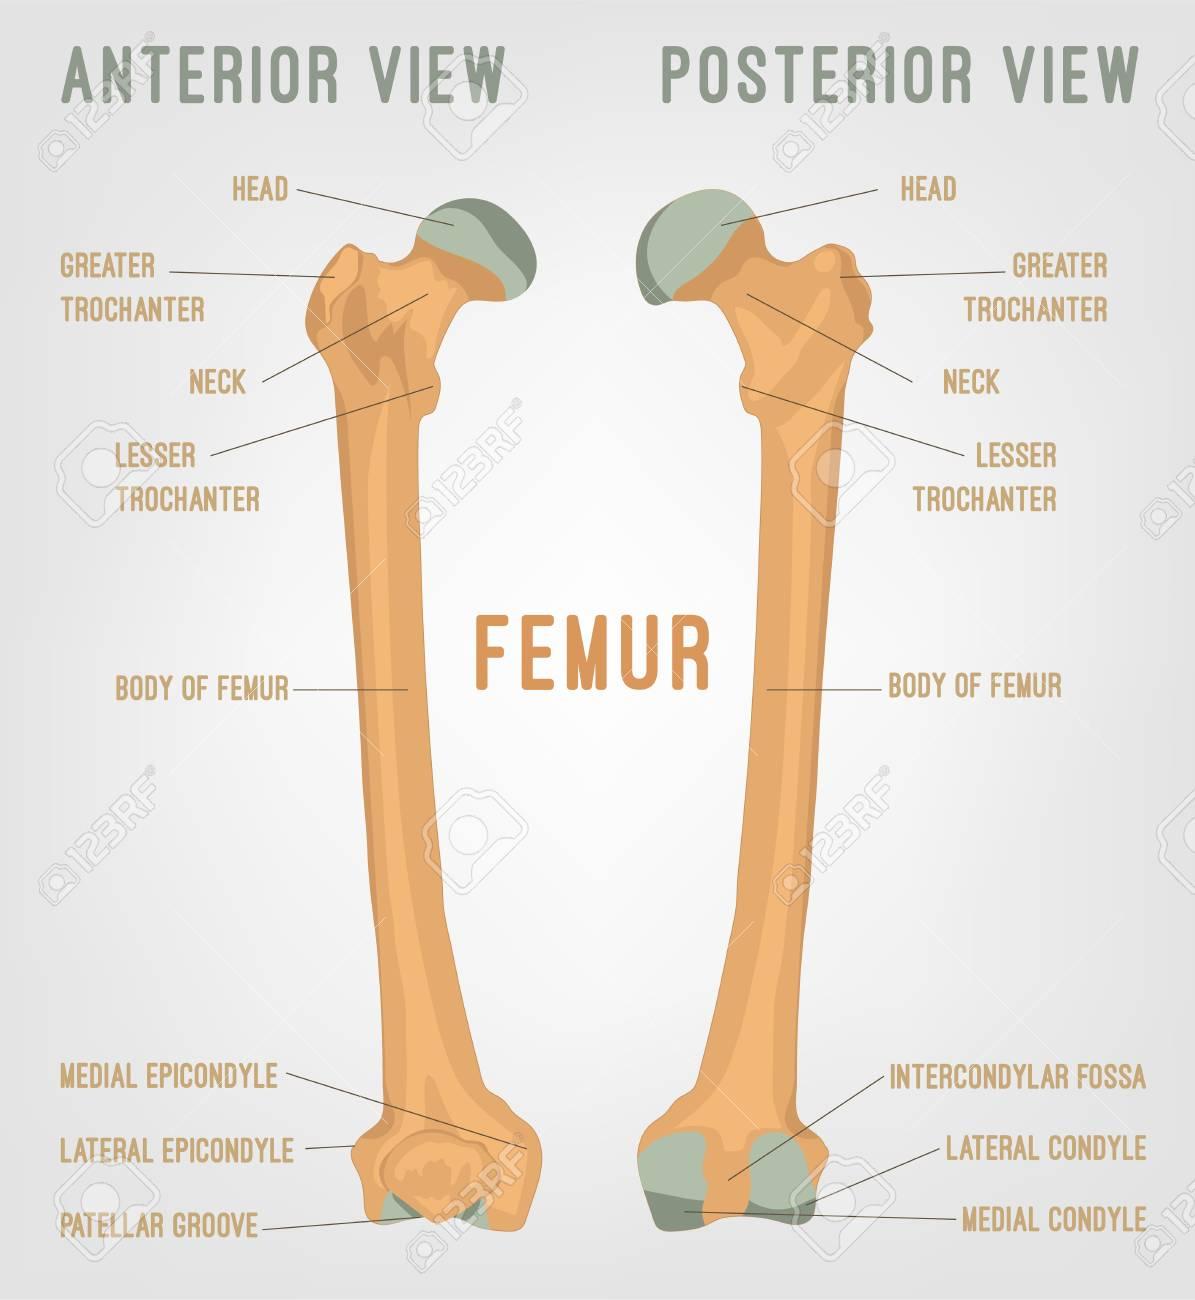 Human Femur Bones Image Vector Illustration Isolated On A White